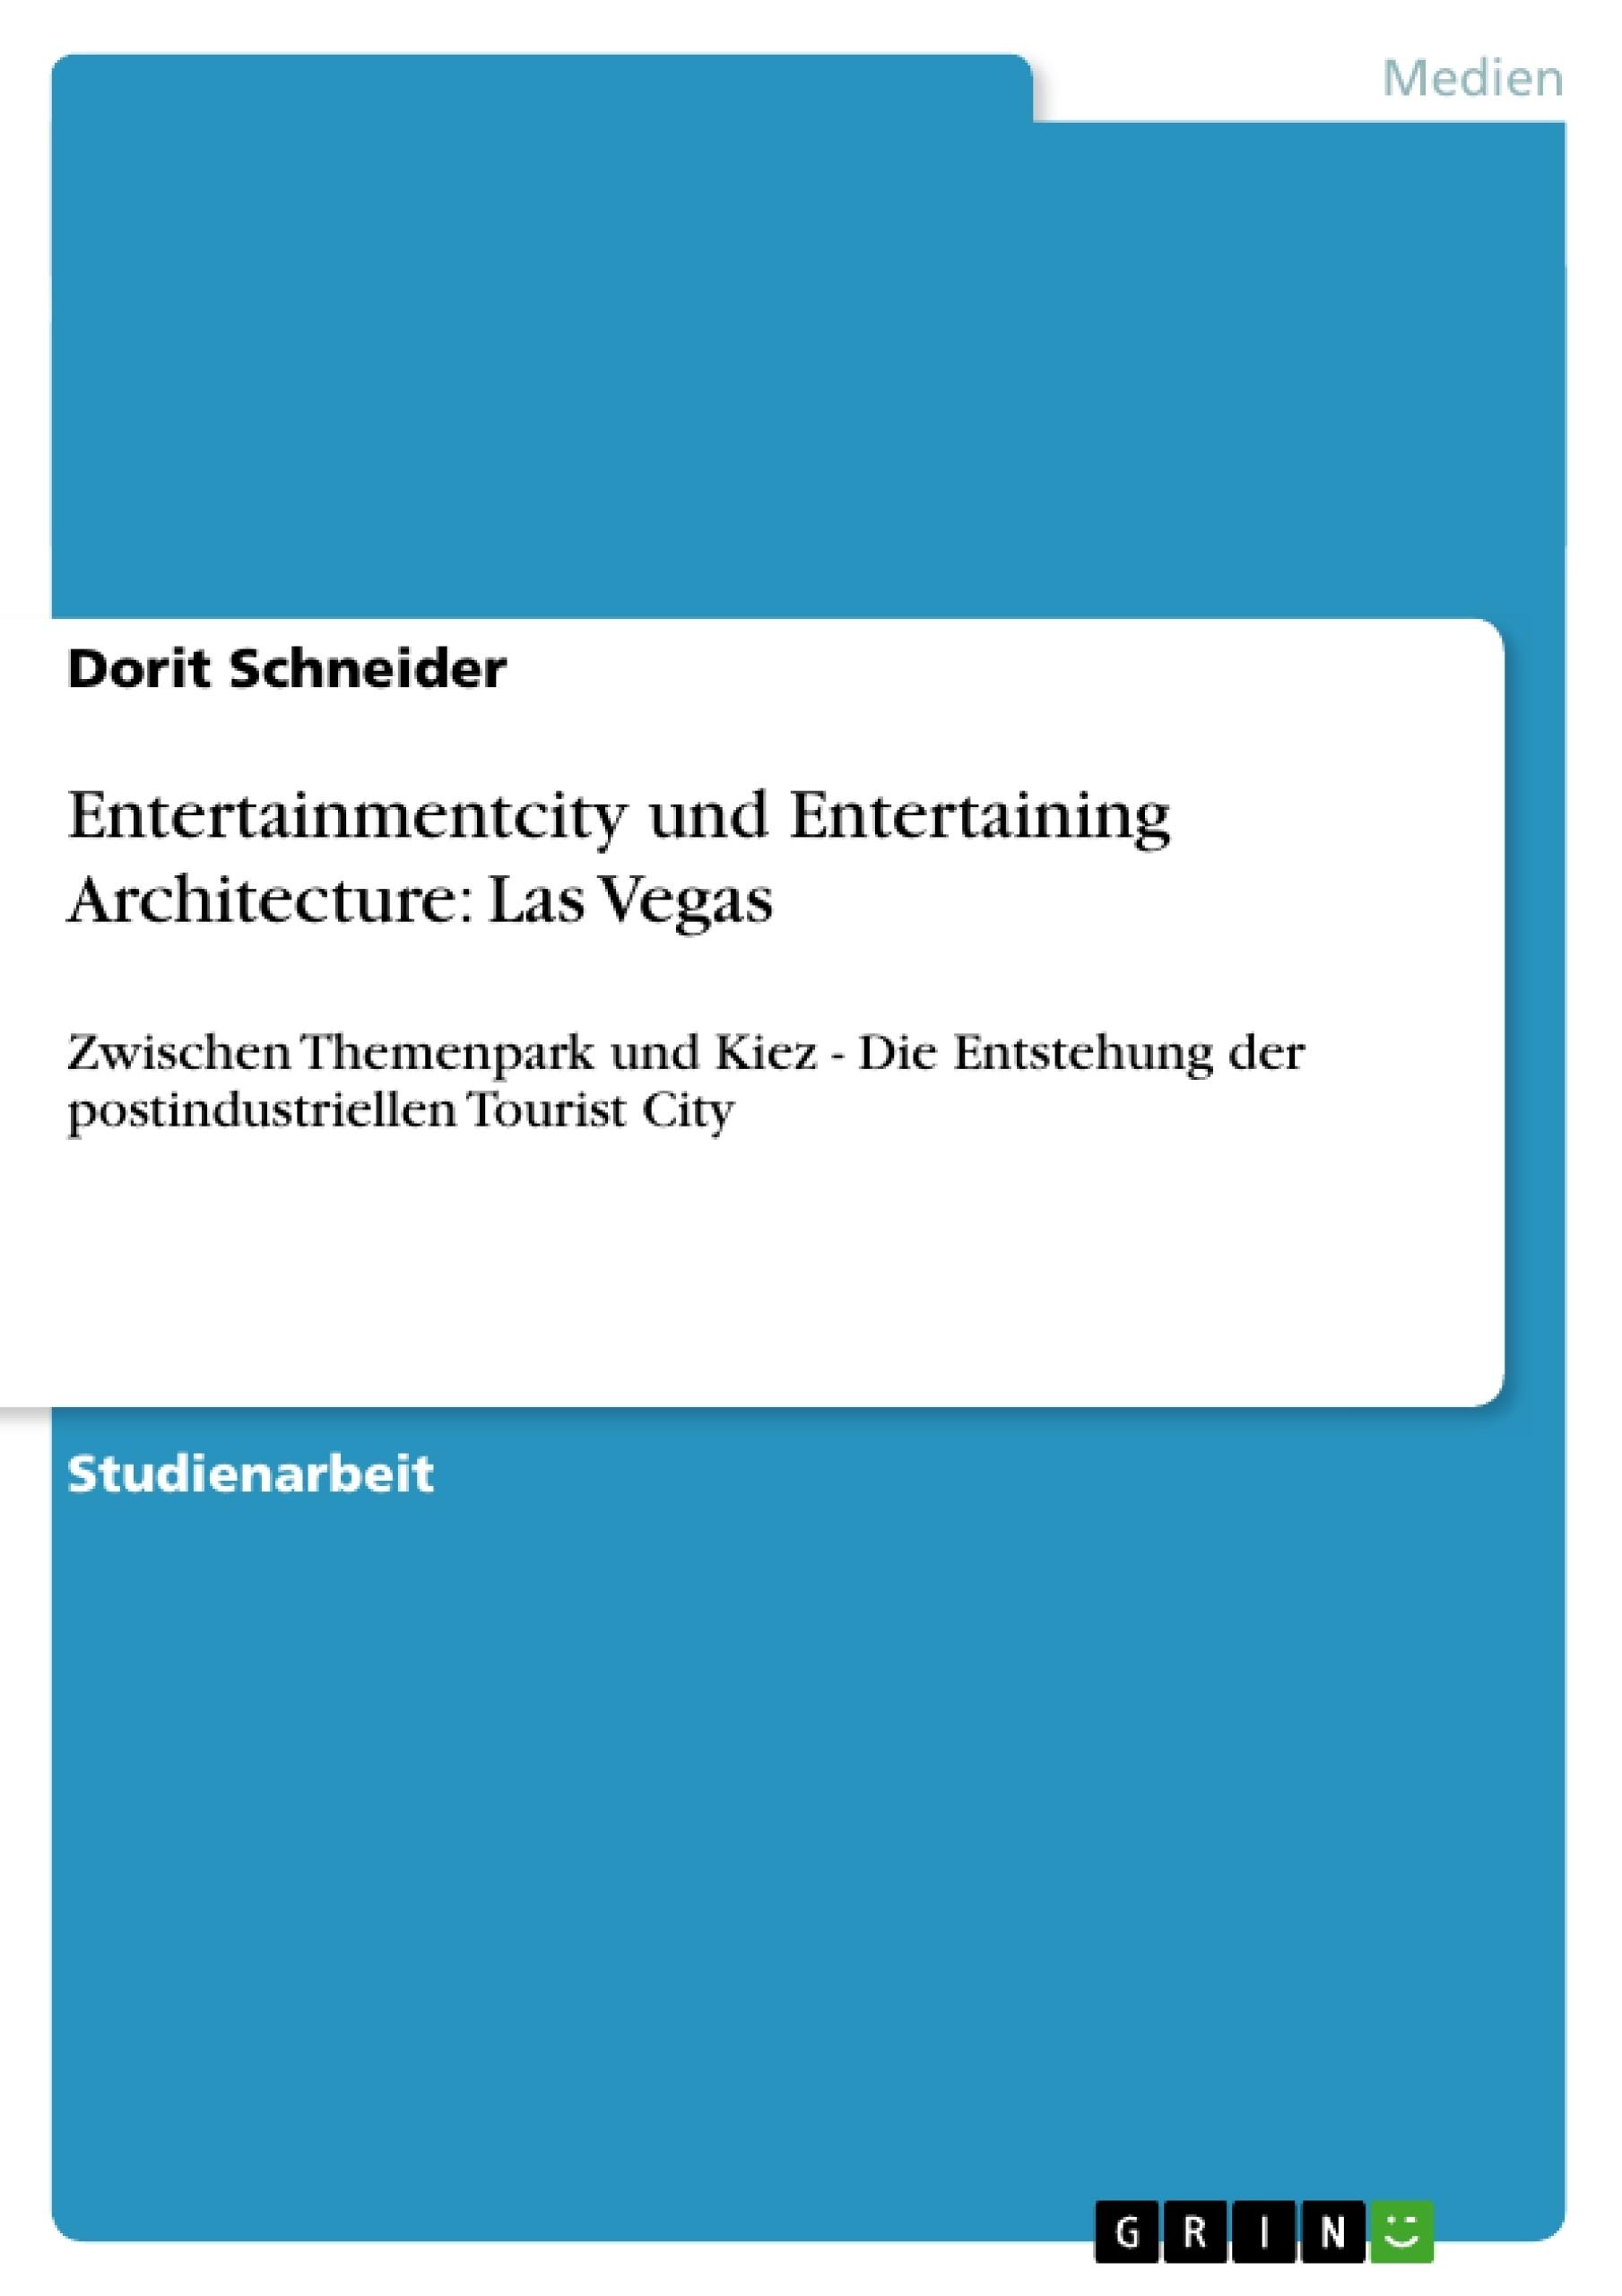 Titel: Entertainmentcity und Entertaining Architecture: Las Vegas